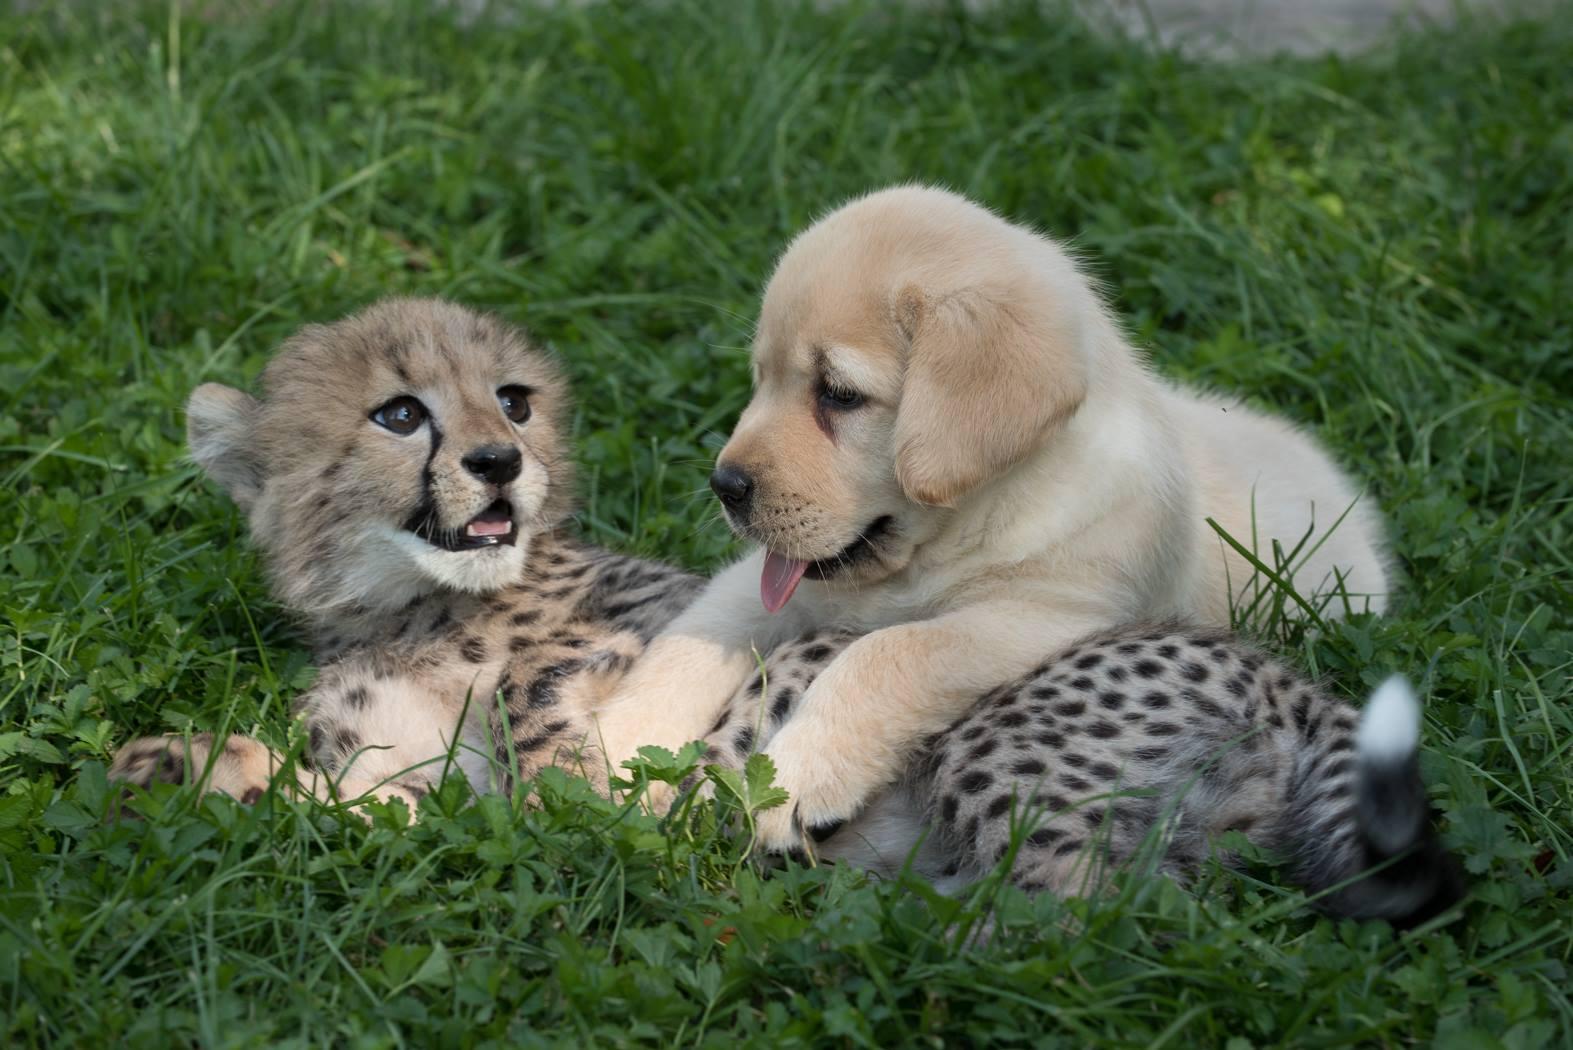 cheetah-puppy-bff-1